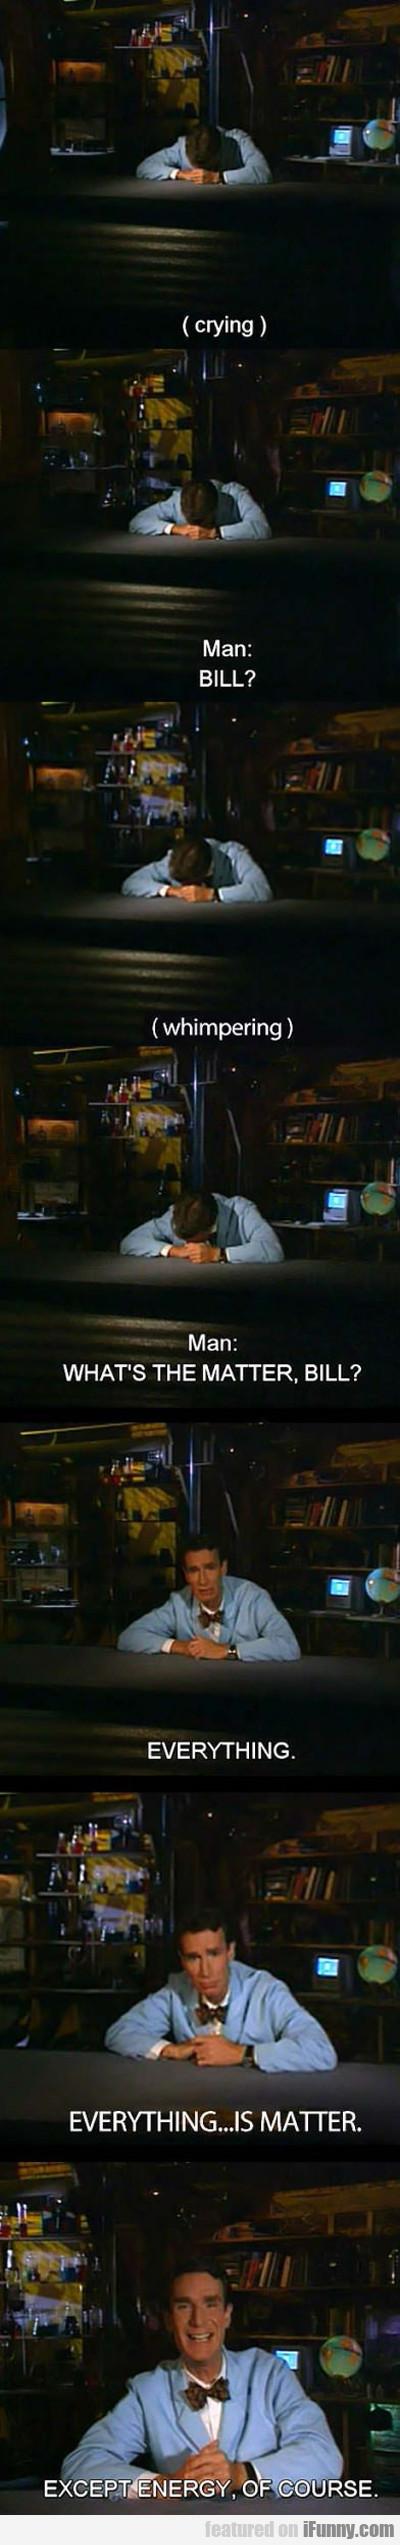 What's The Matter, Bill?